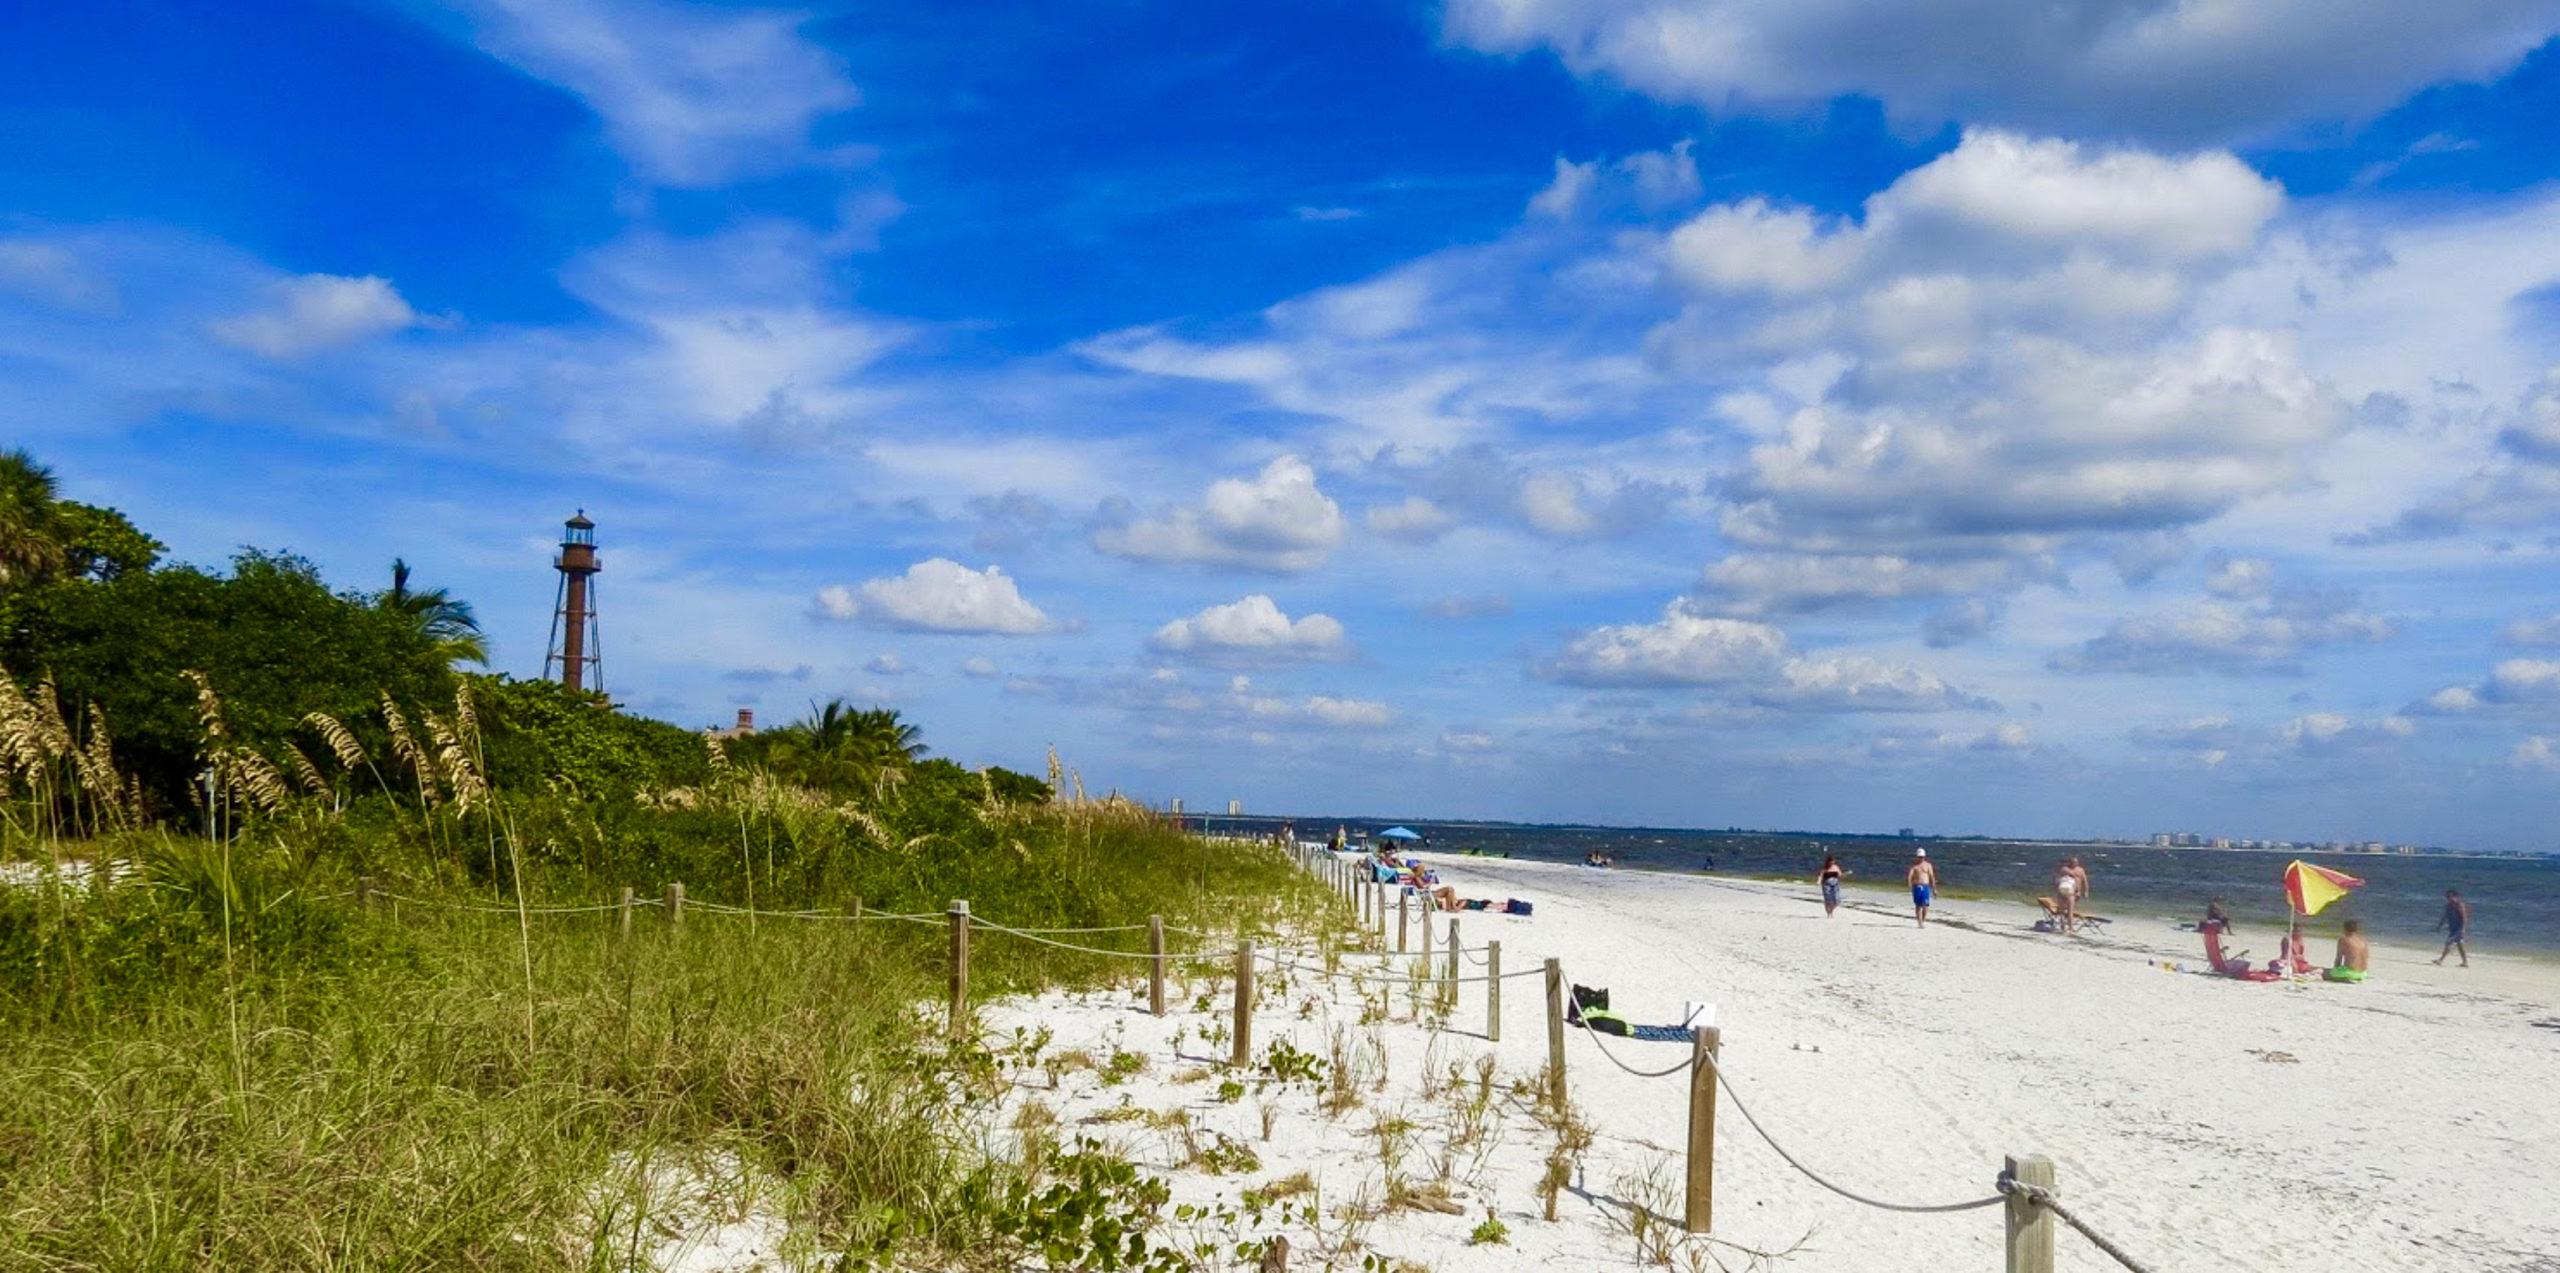 Beaches of the Islands - Beach Road Villas, Sanibel, FL